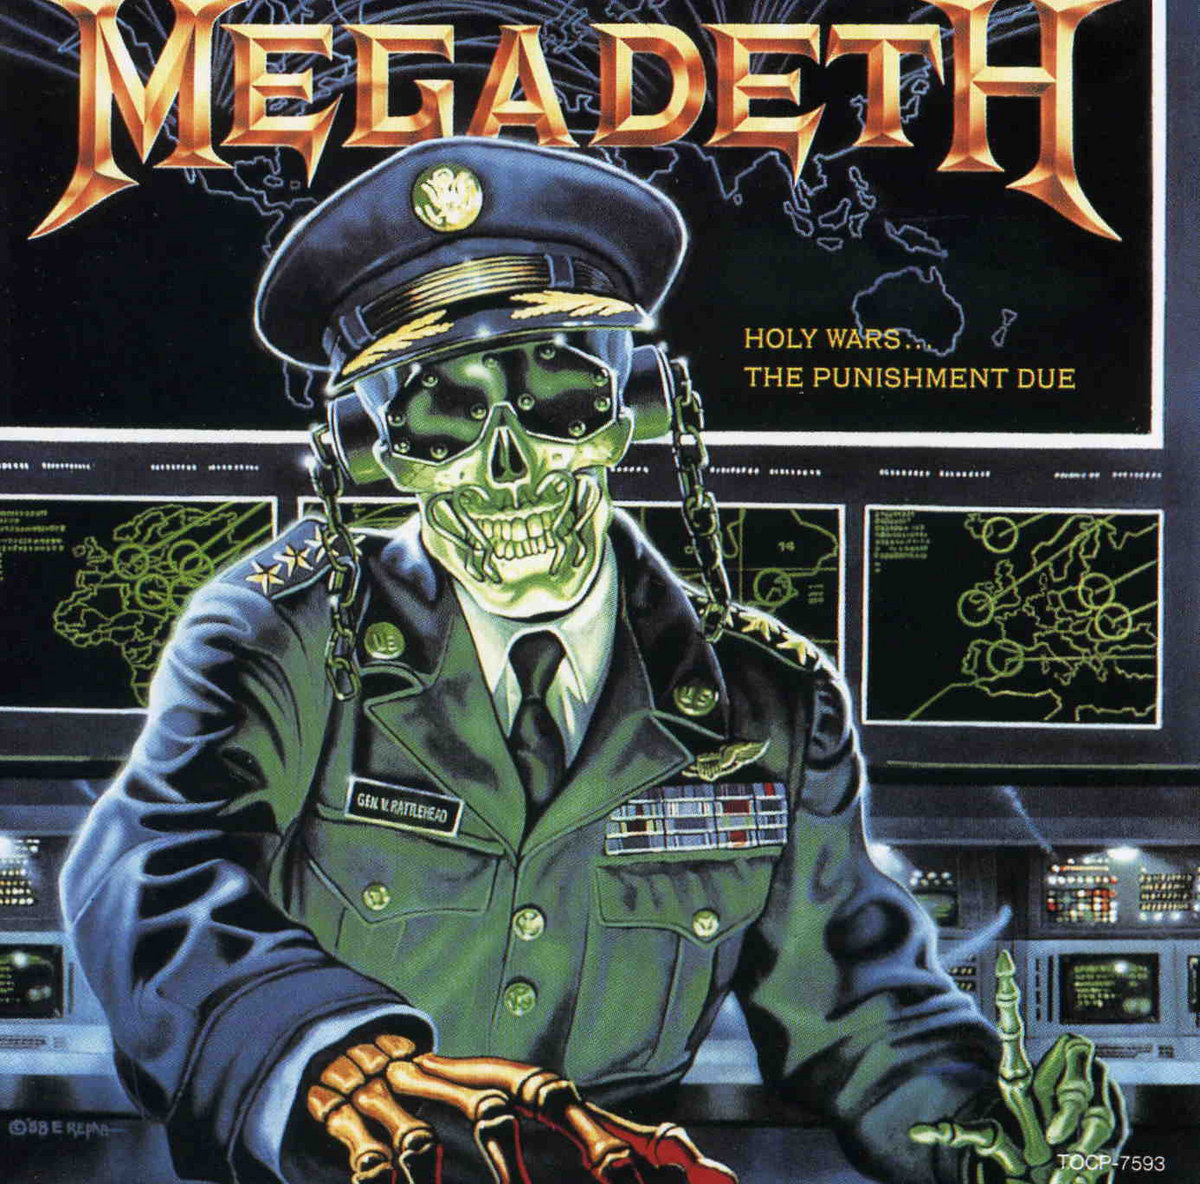 "Megadeth - Holy Wars ""Instrumental"" (Remastered By: Nate Whittaker) |  Megadeth, Nate Whittaker | Nate Whittaker"